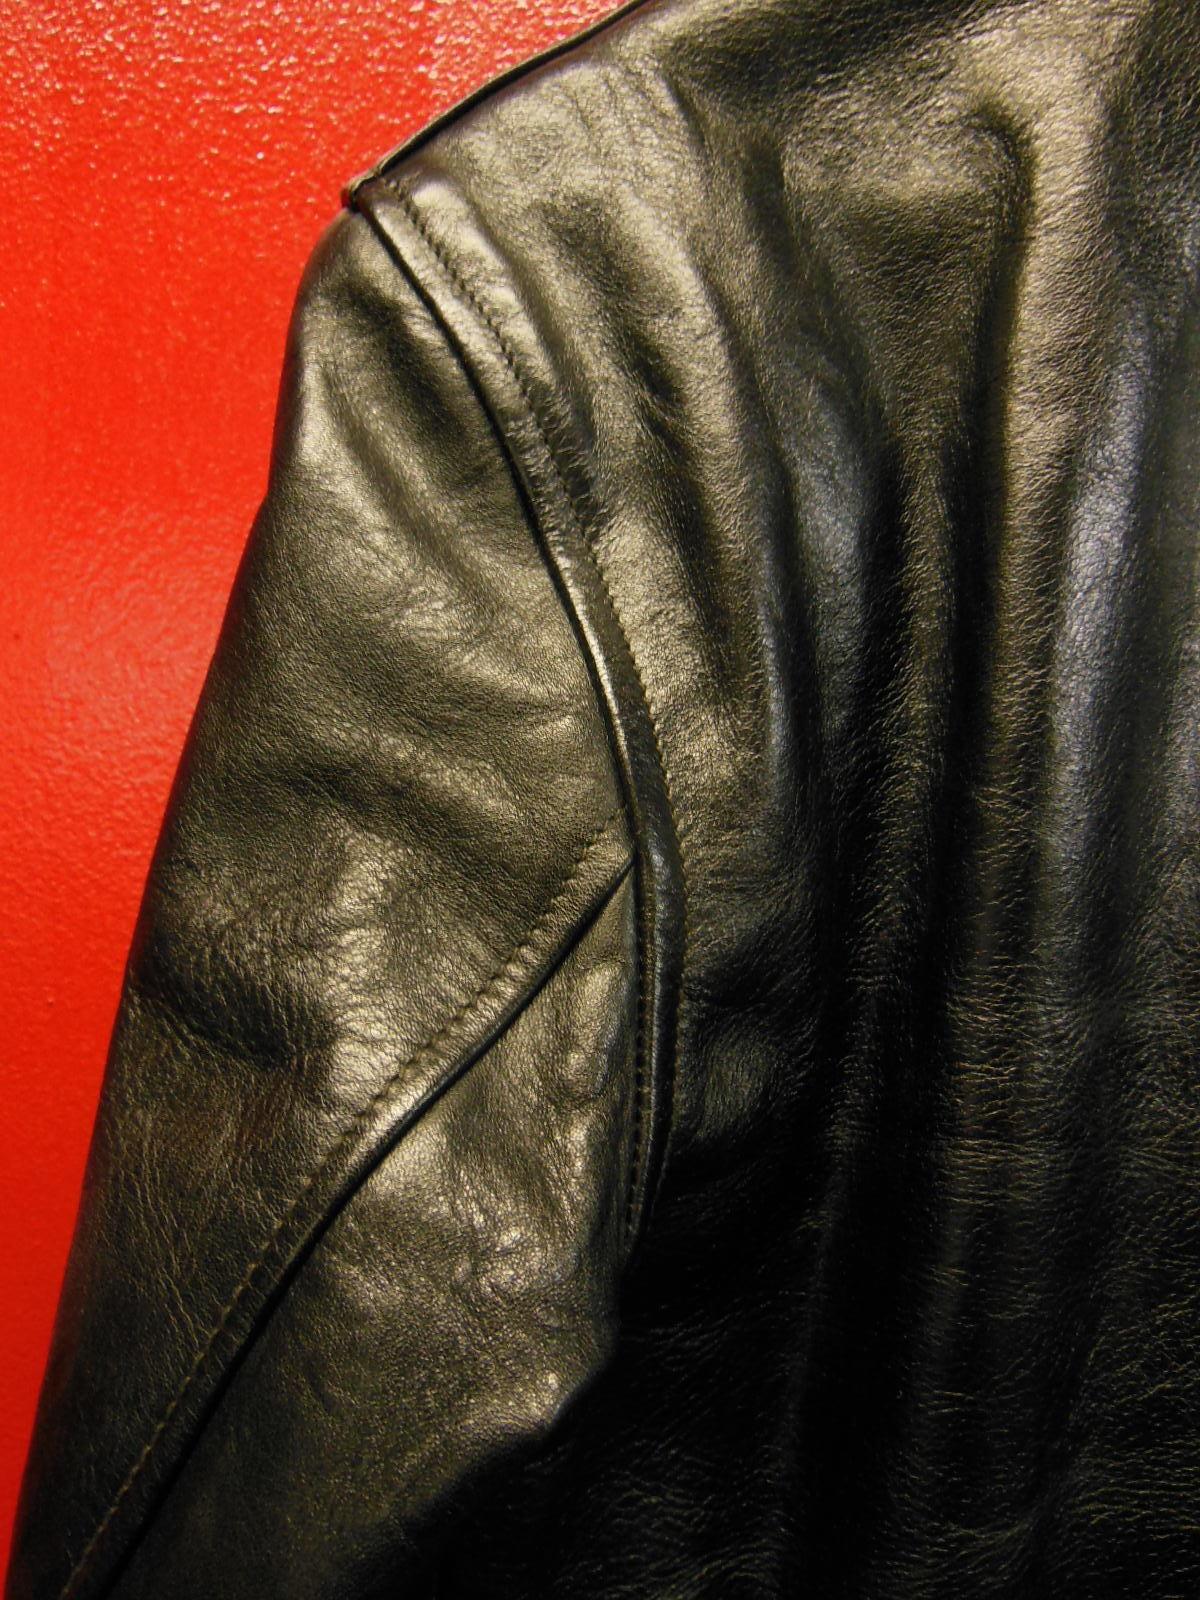 USED HIMEL BROTHERS LEATHER HERON 1929/新喜皮革製黒ホースハイド/SIZE-36/ボタンフロント A-1 ジャケット_c0187684_14592305.jpg